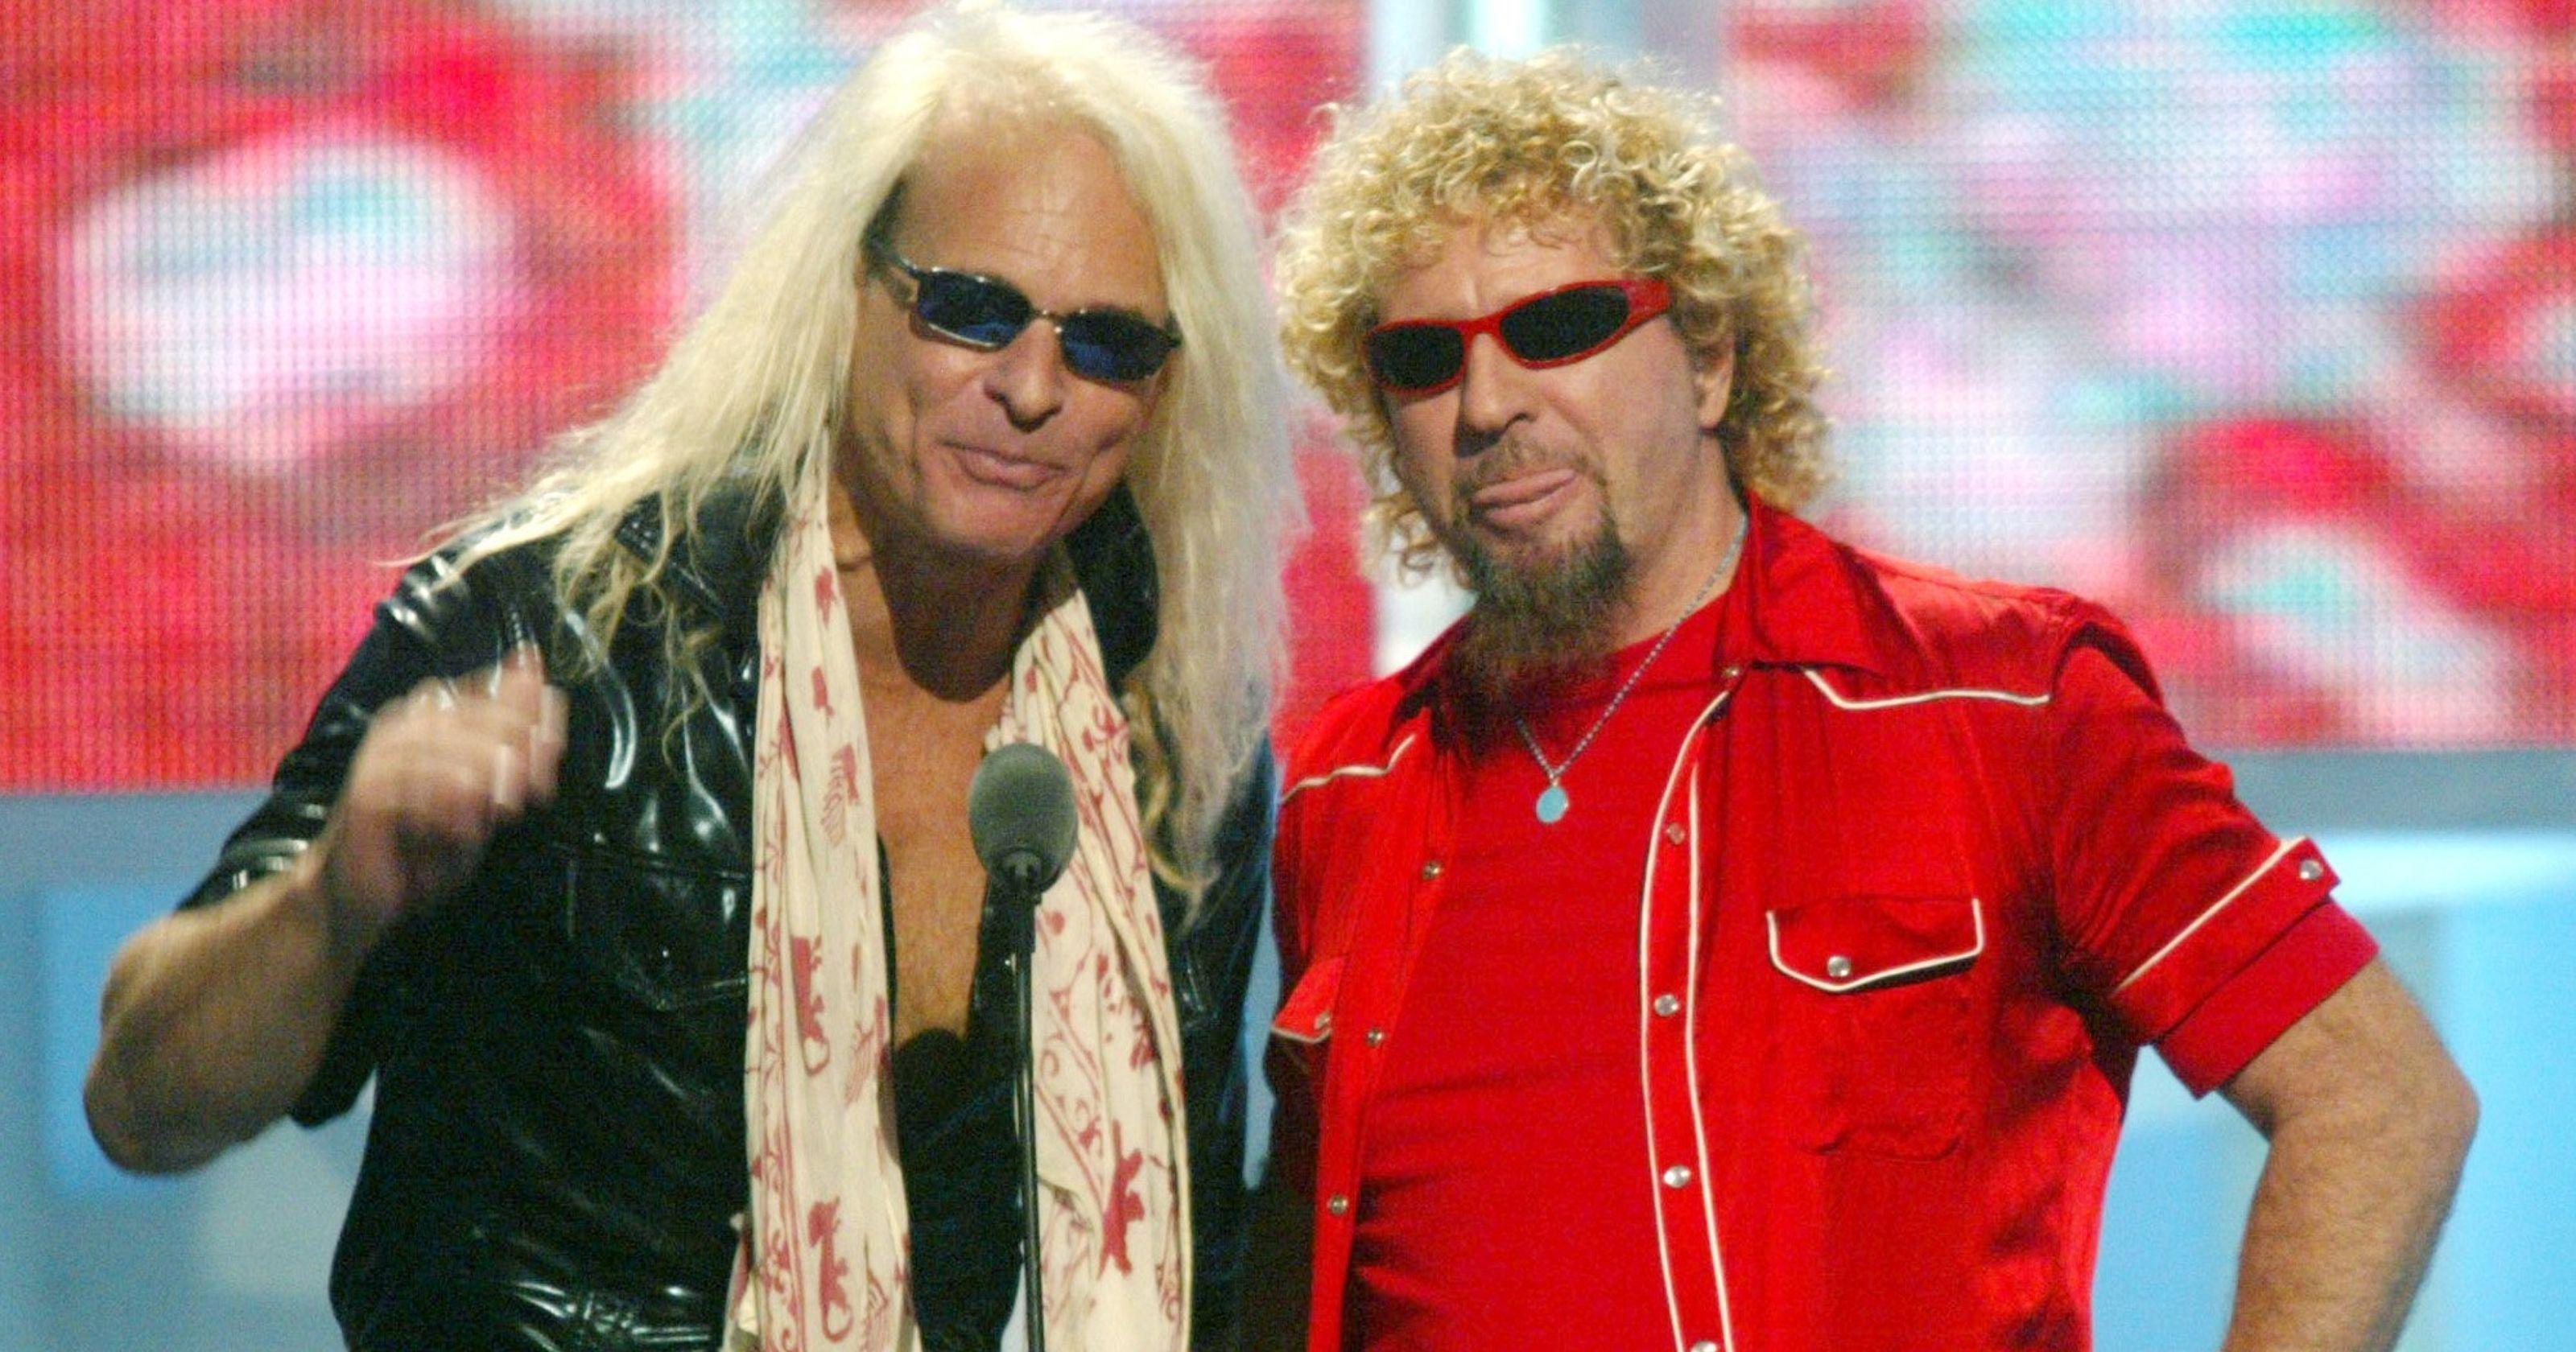 Sammy Hagar Wants David Lee Roth For His Festival Rock Music News Rock Music Van Halen